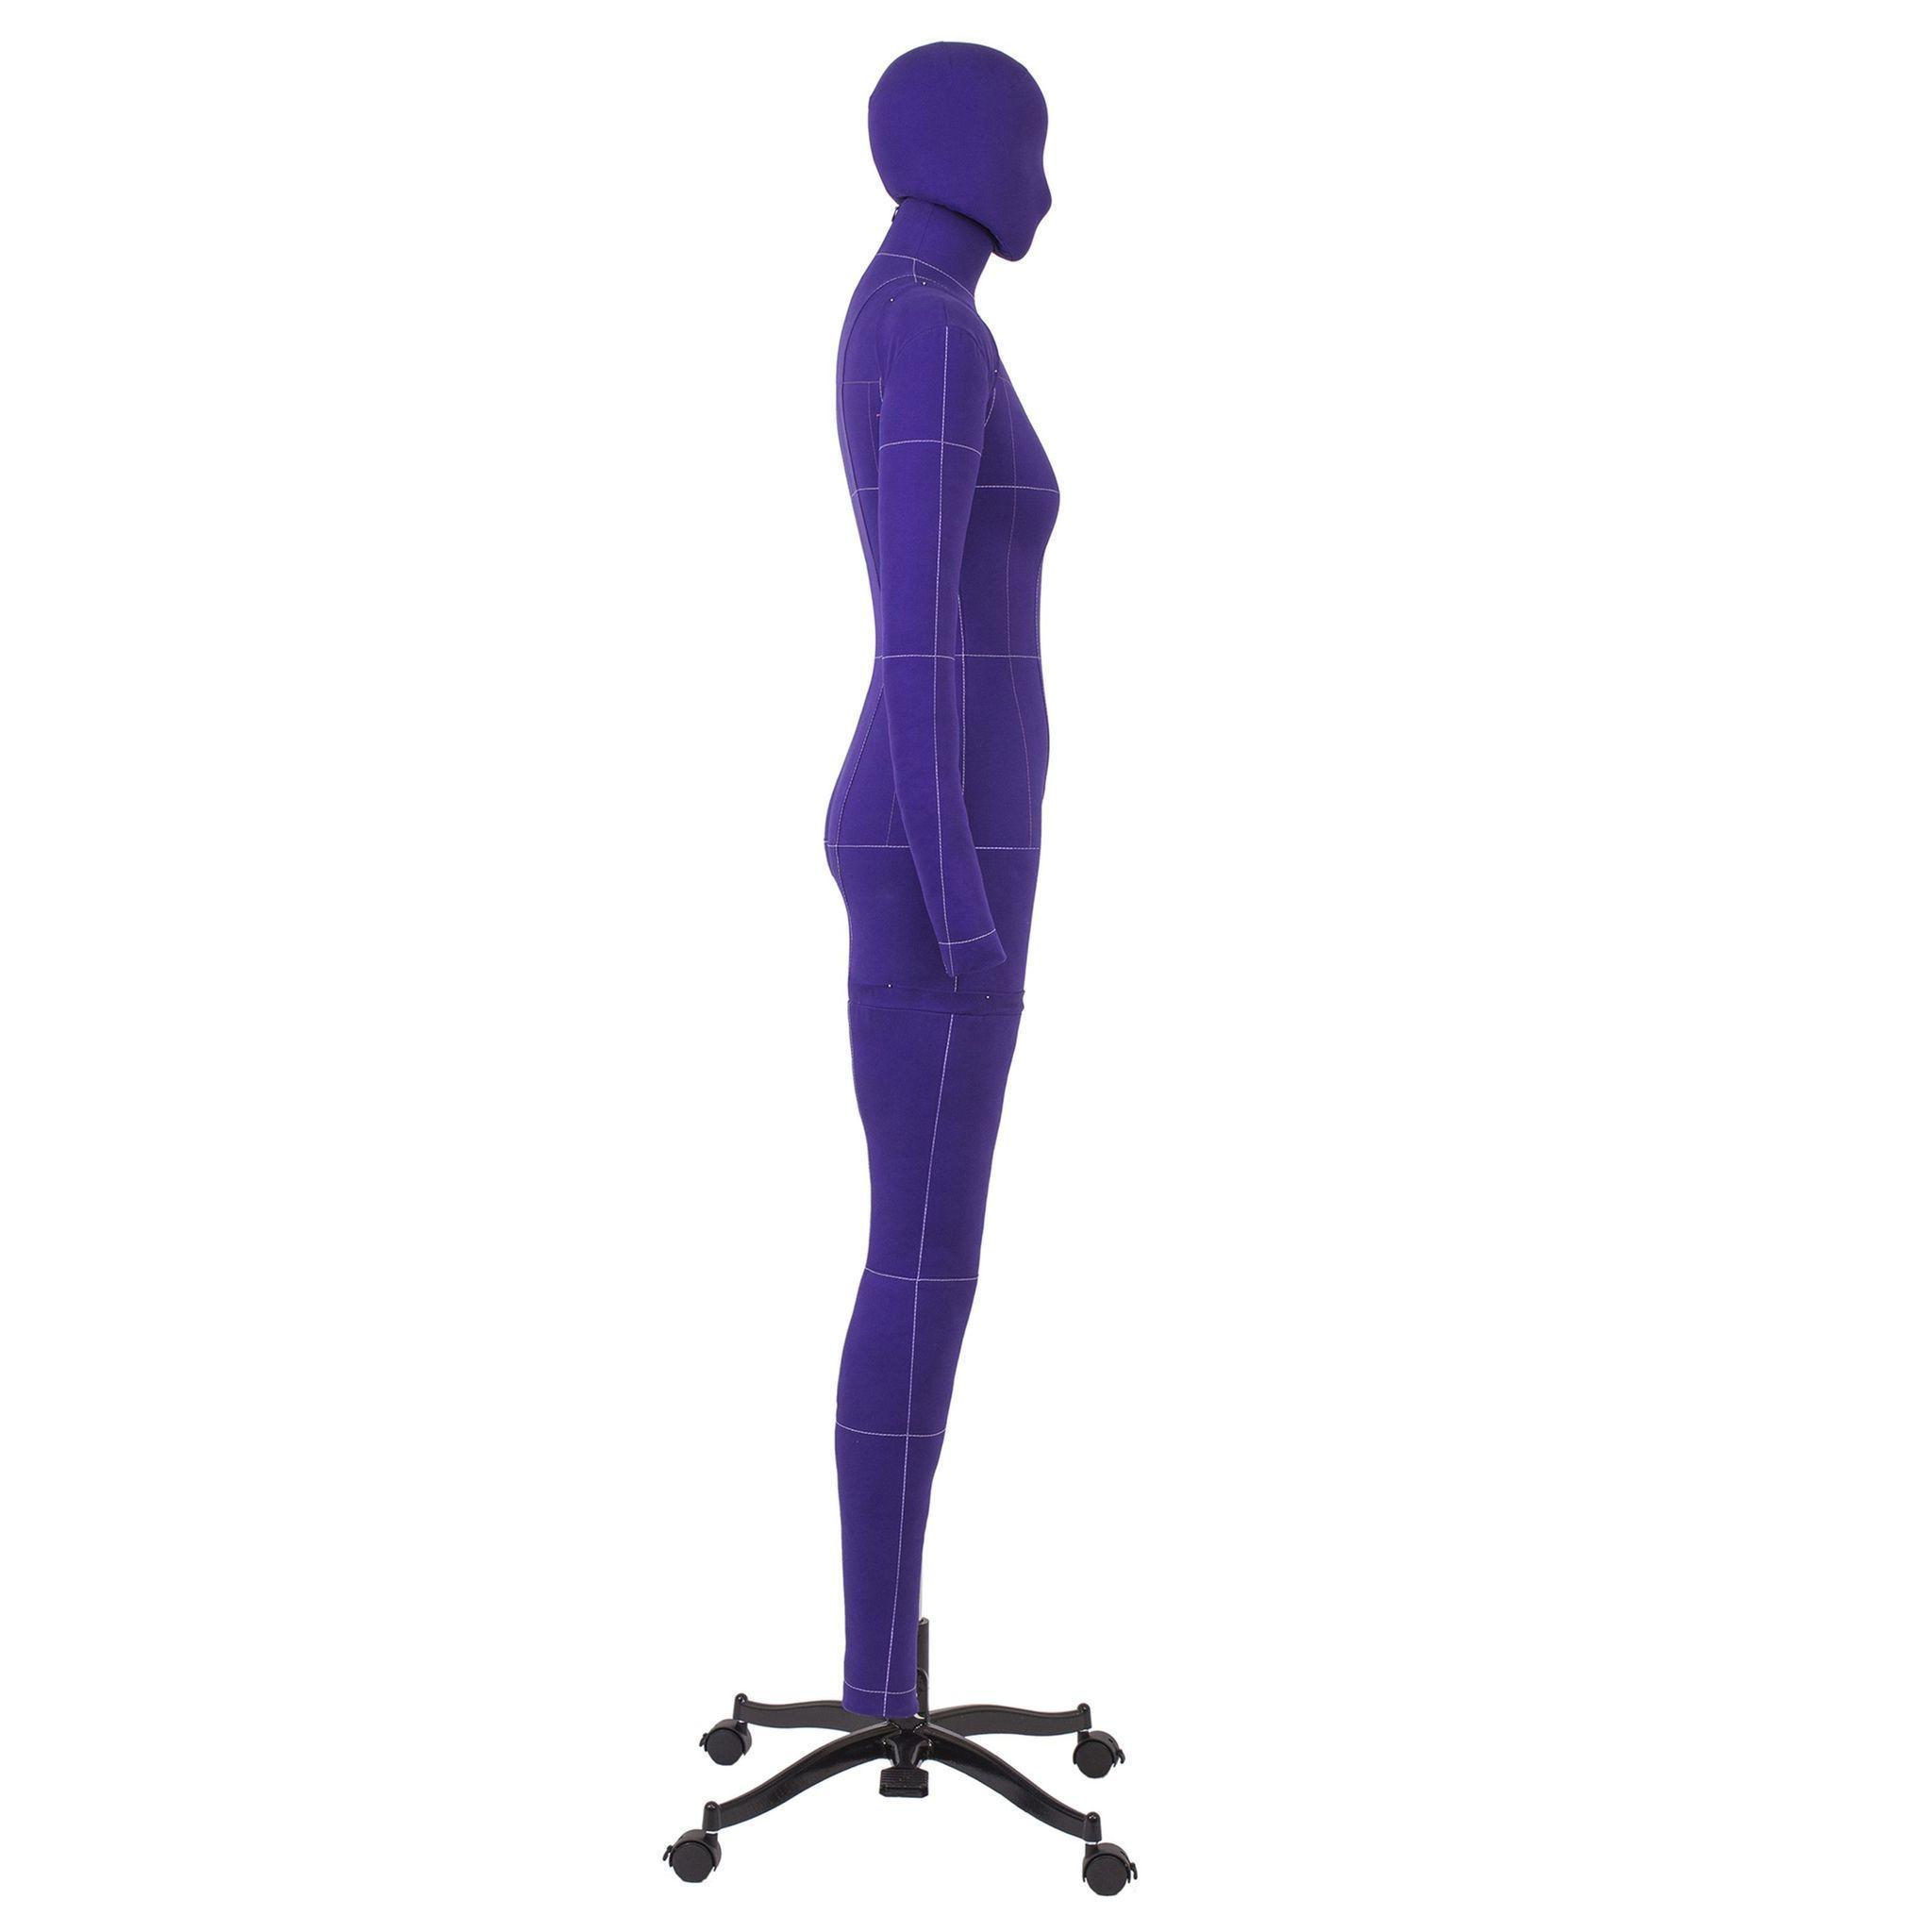 Манекен портновский Моника, комплект Арт, размер 52, ФиолетовыйФото 4